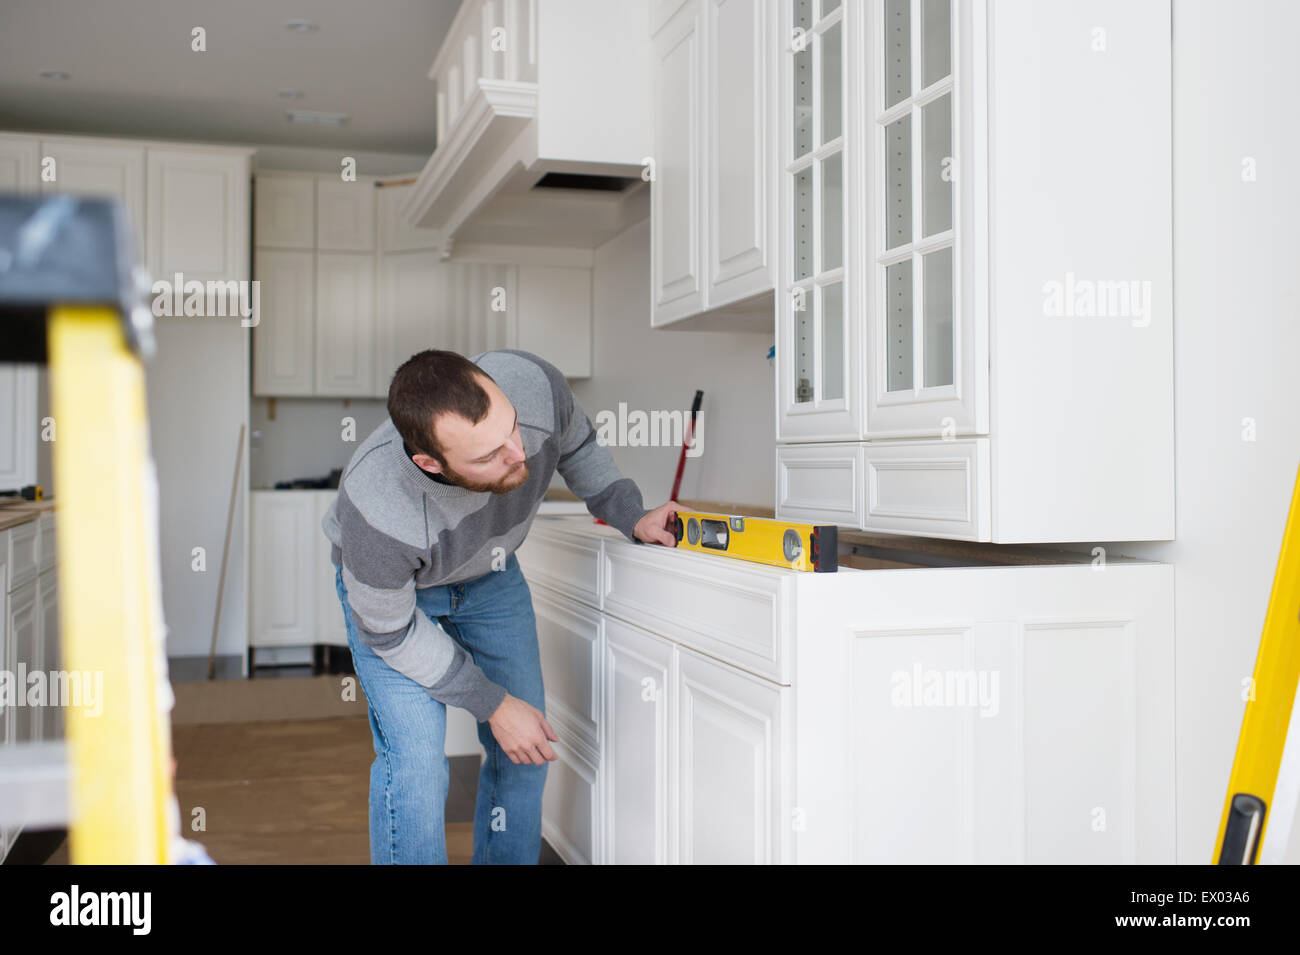 Carpenter installing kitchen cabinet - Stock Image